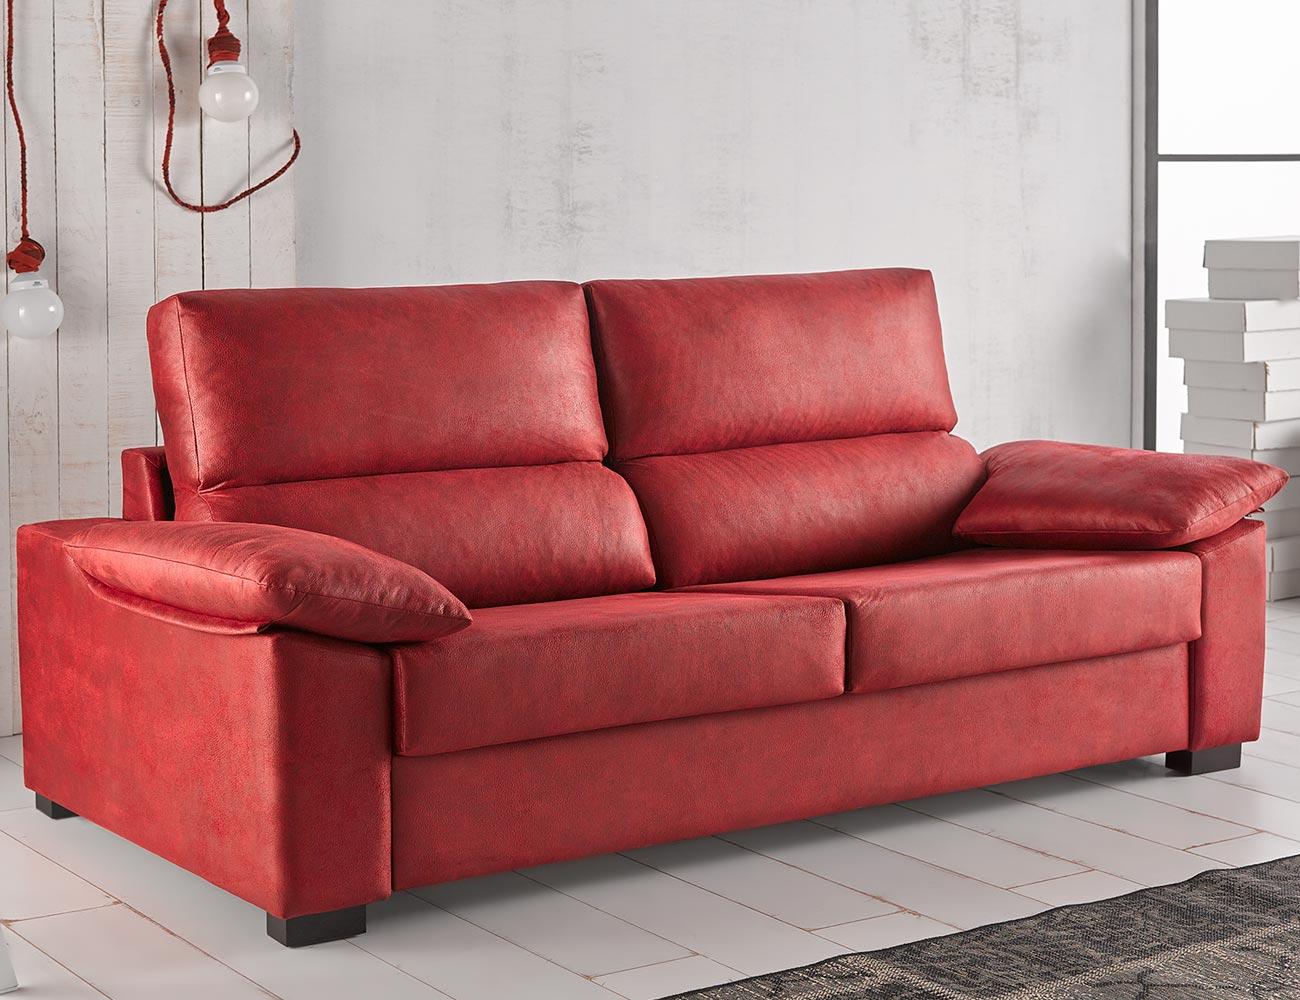 Sofa cama apertura italiano gran calidad leire rojo